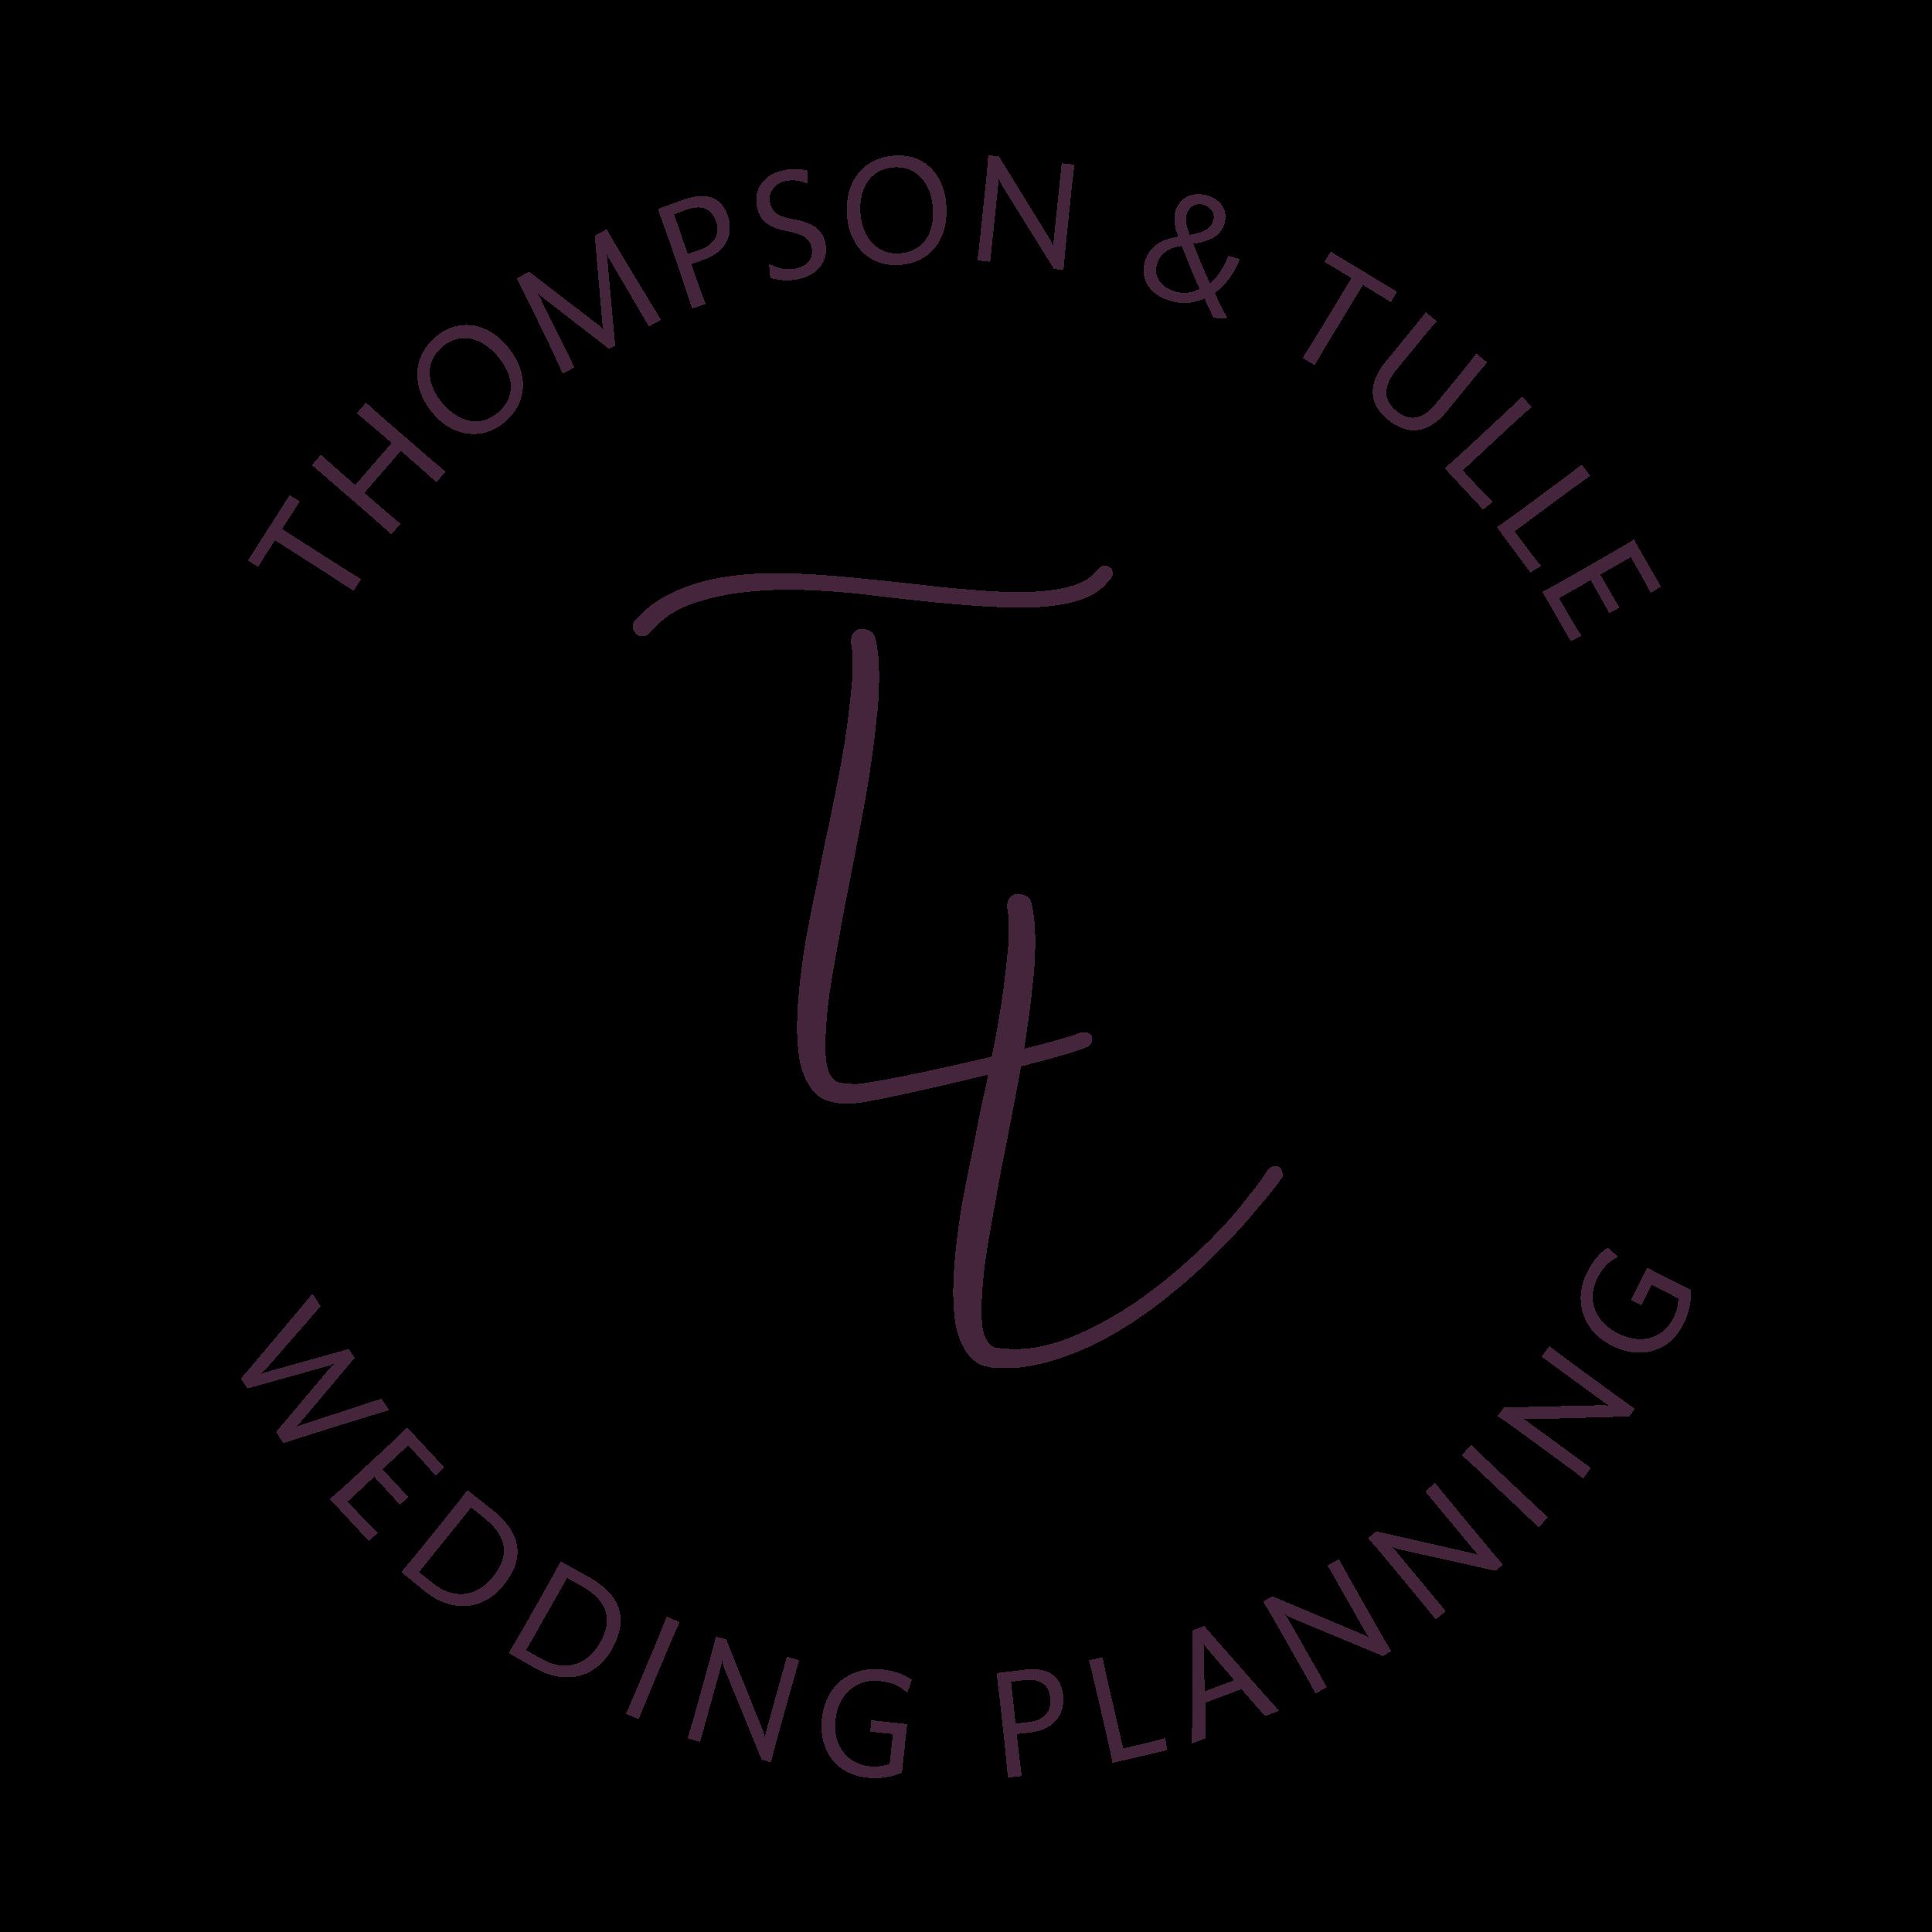 Thompson & Tulle